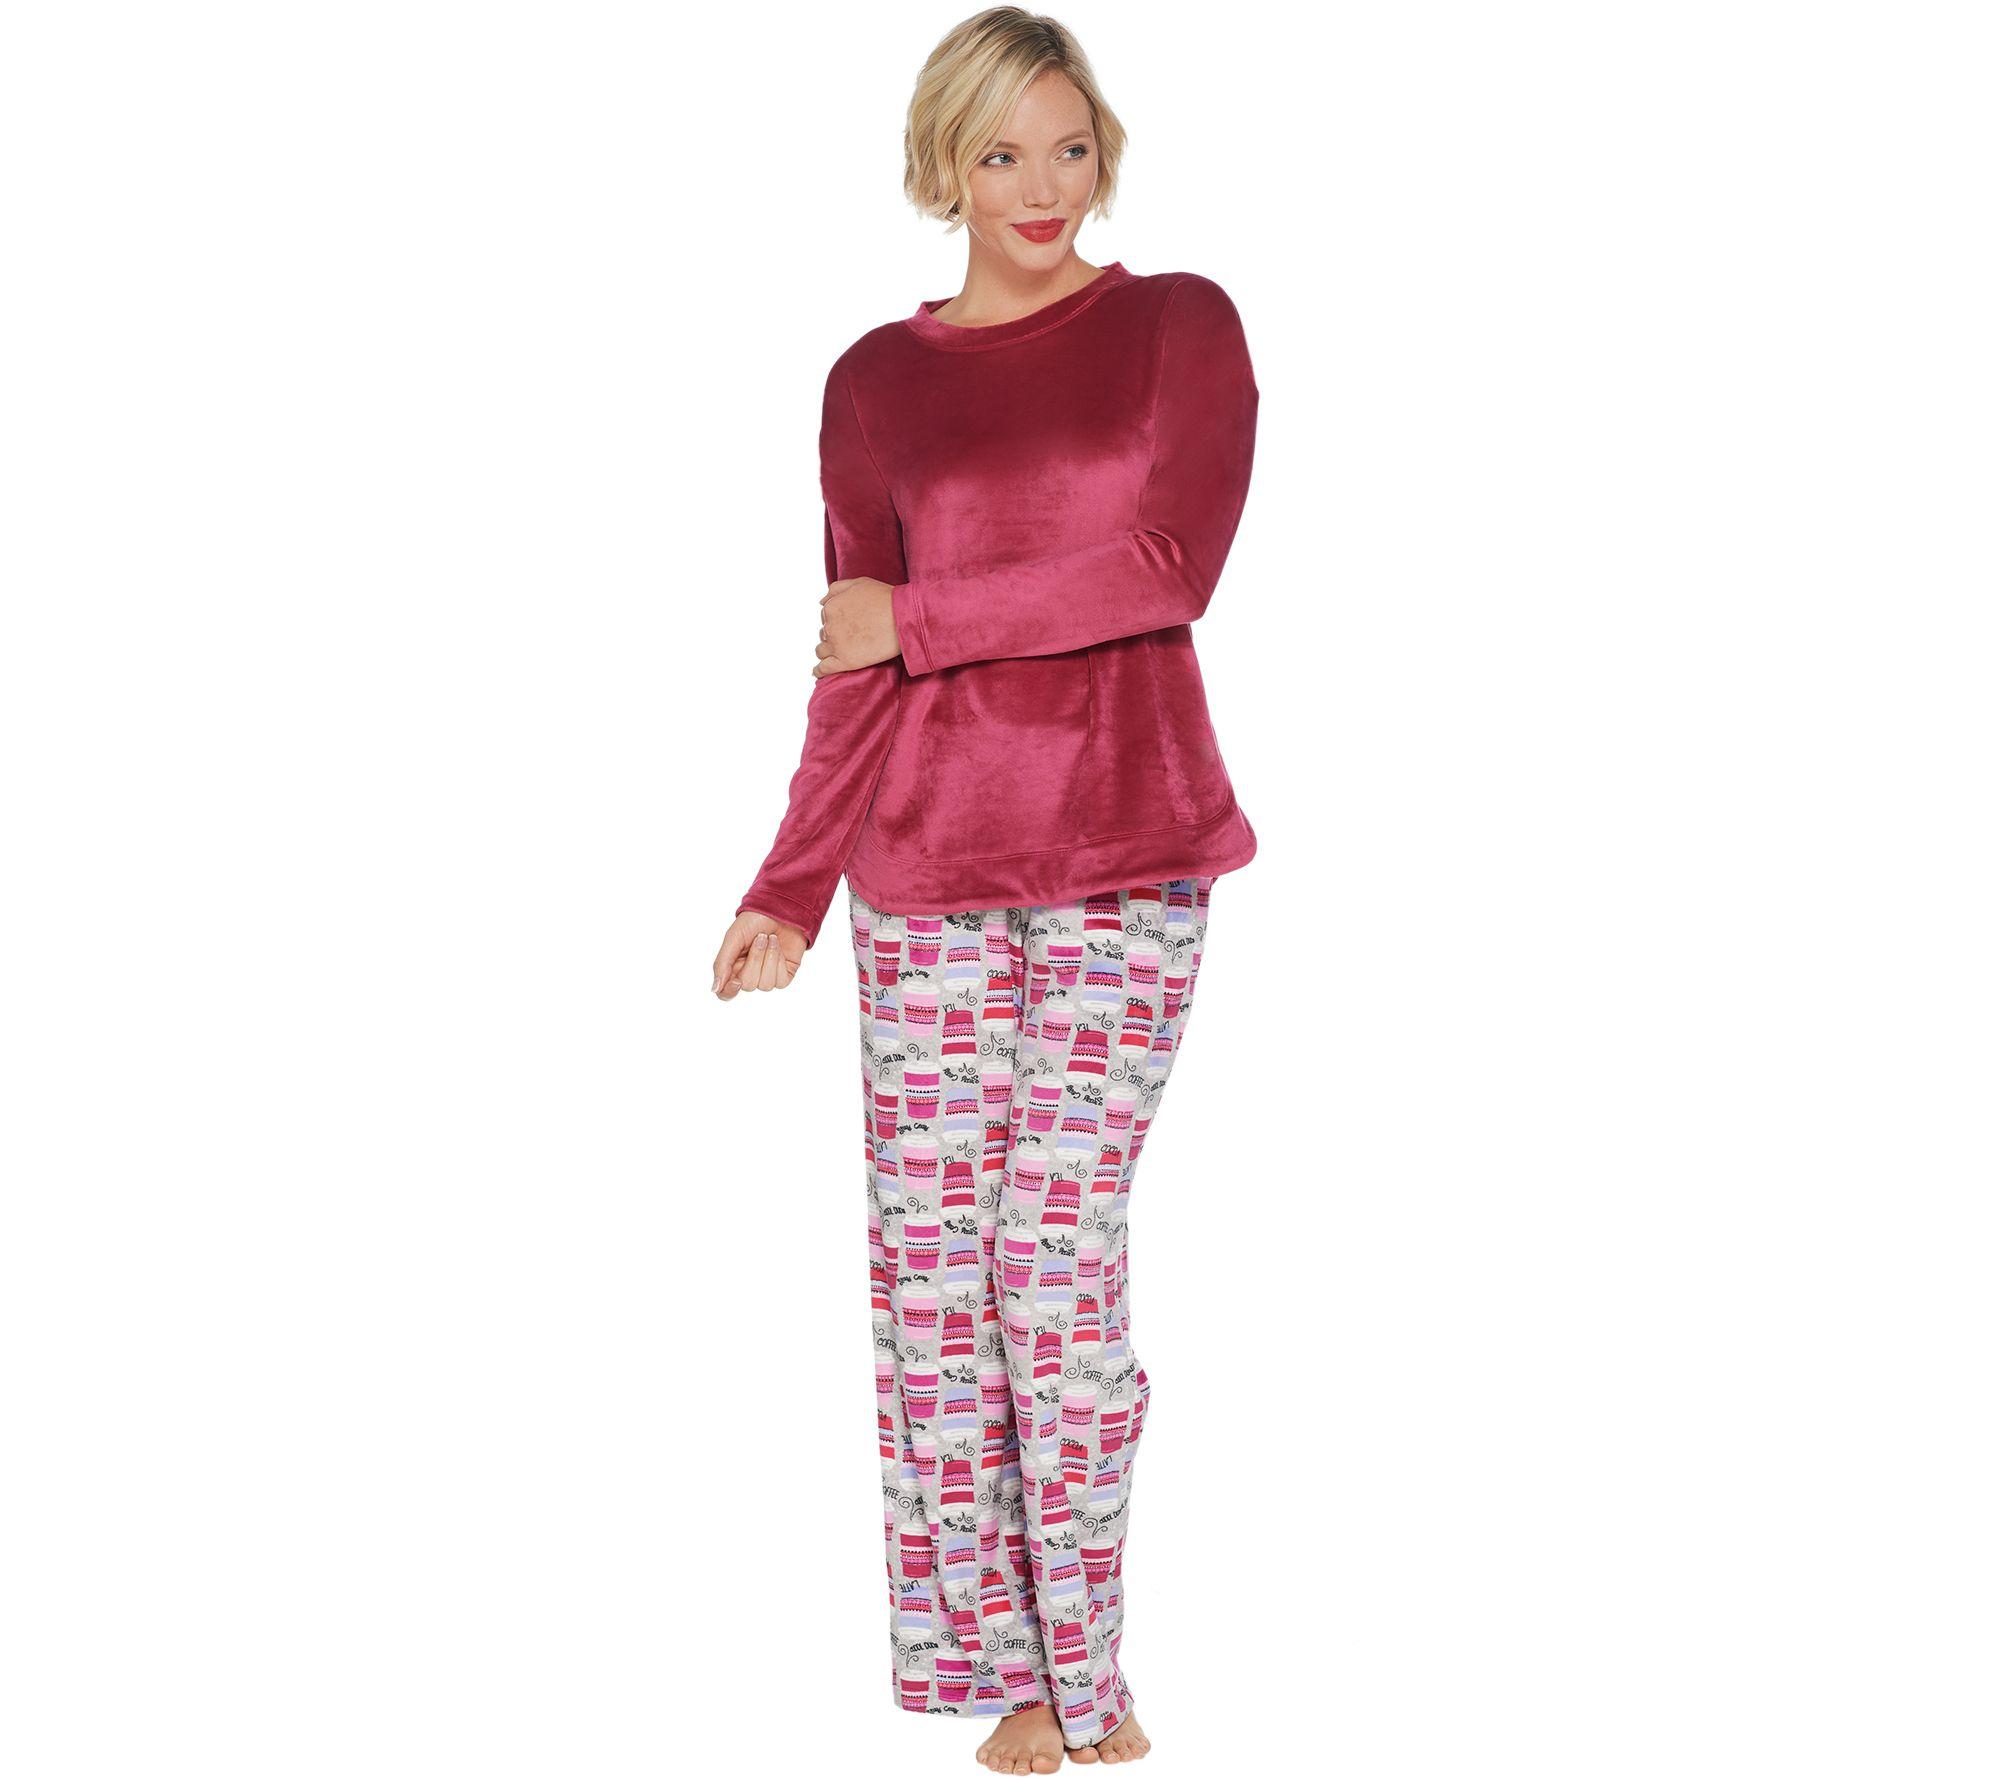 9a30ad76f05 Cuddl Duds Ultra Plush Velvet Fleece Novelty Pajama Set - Page 1 — QVC.com